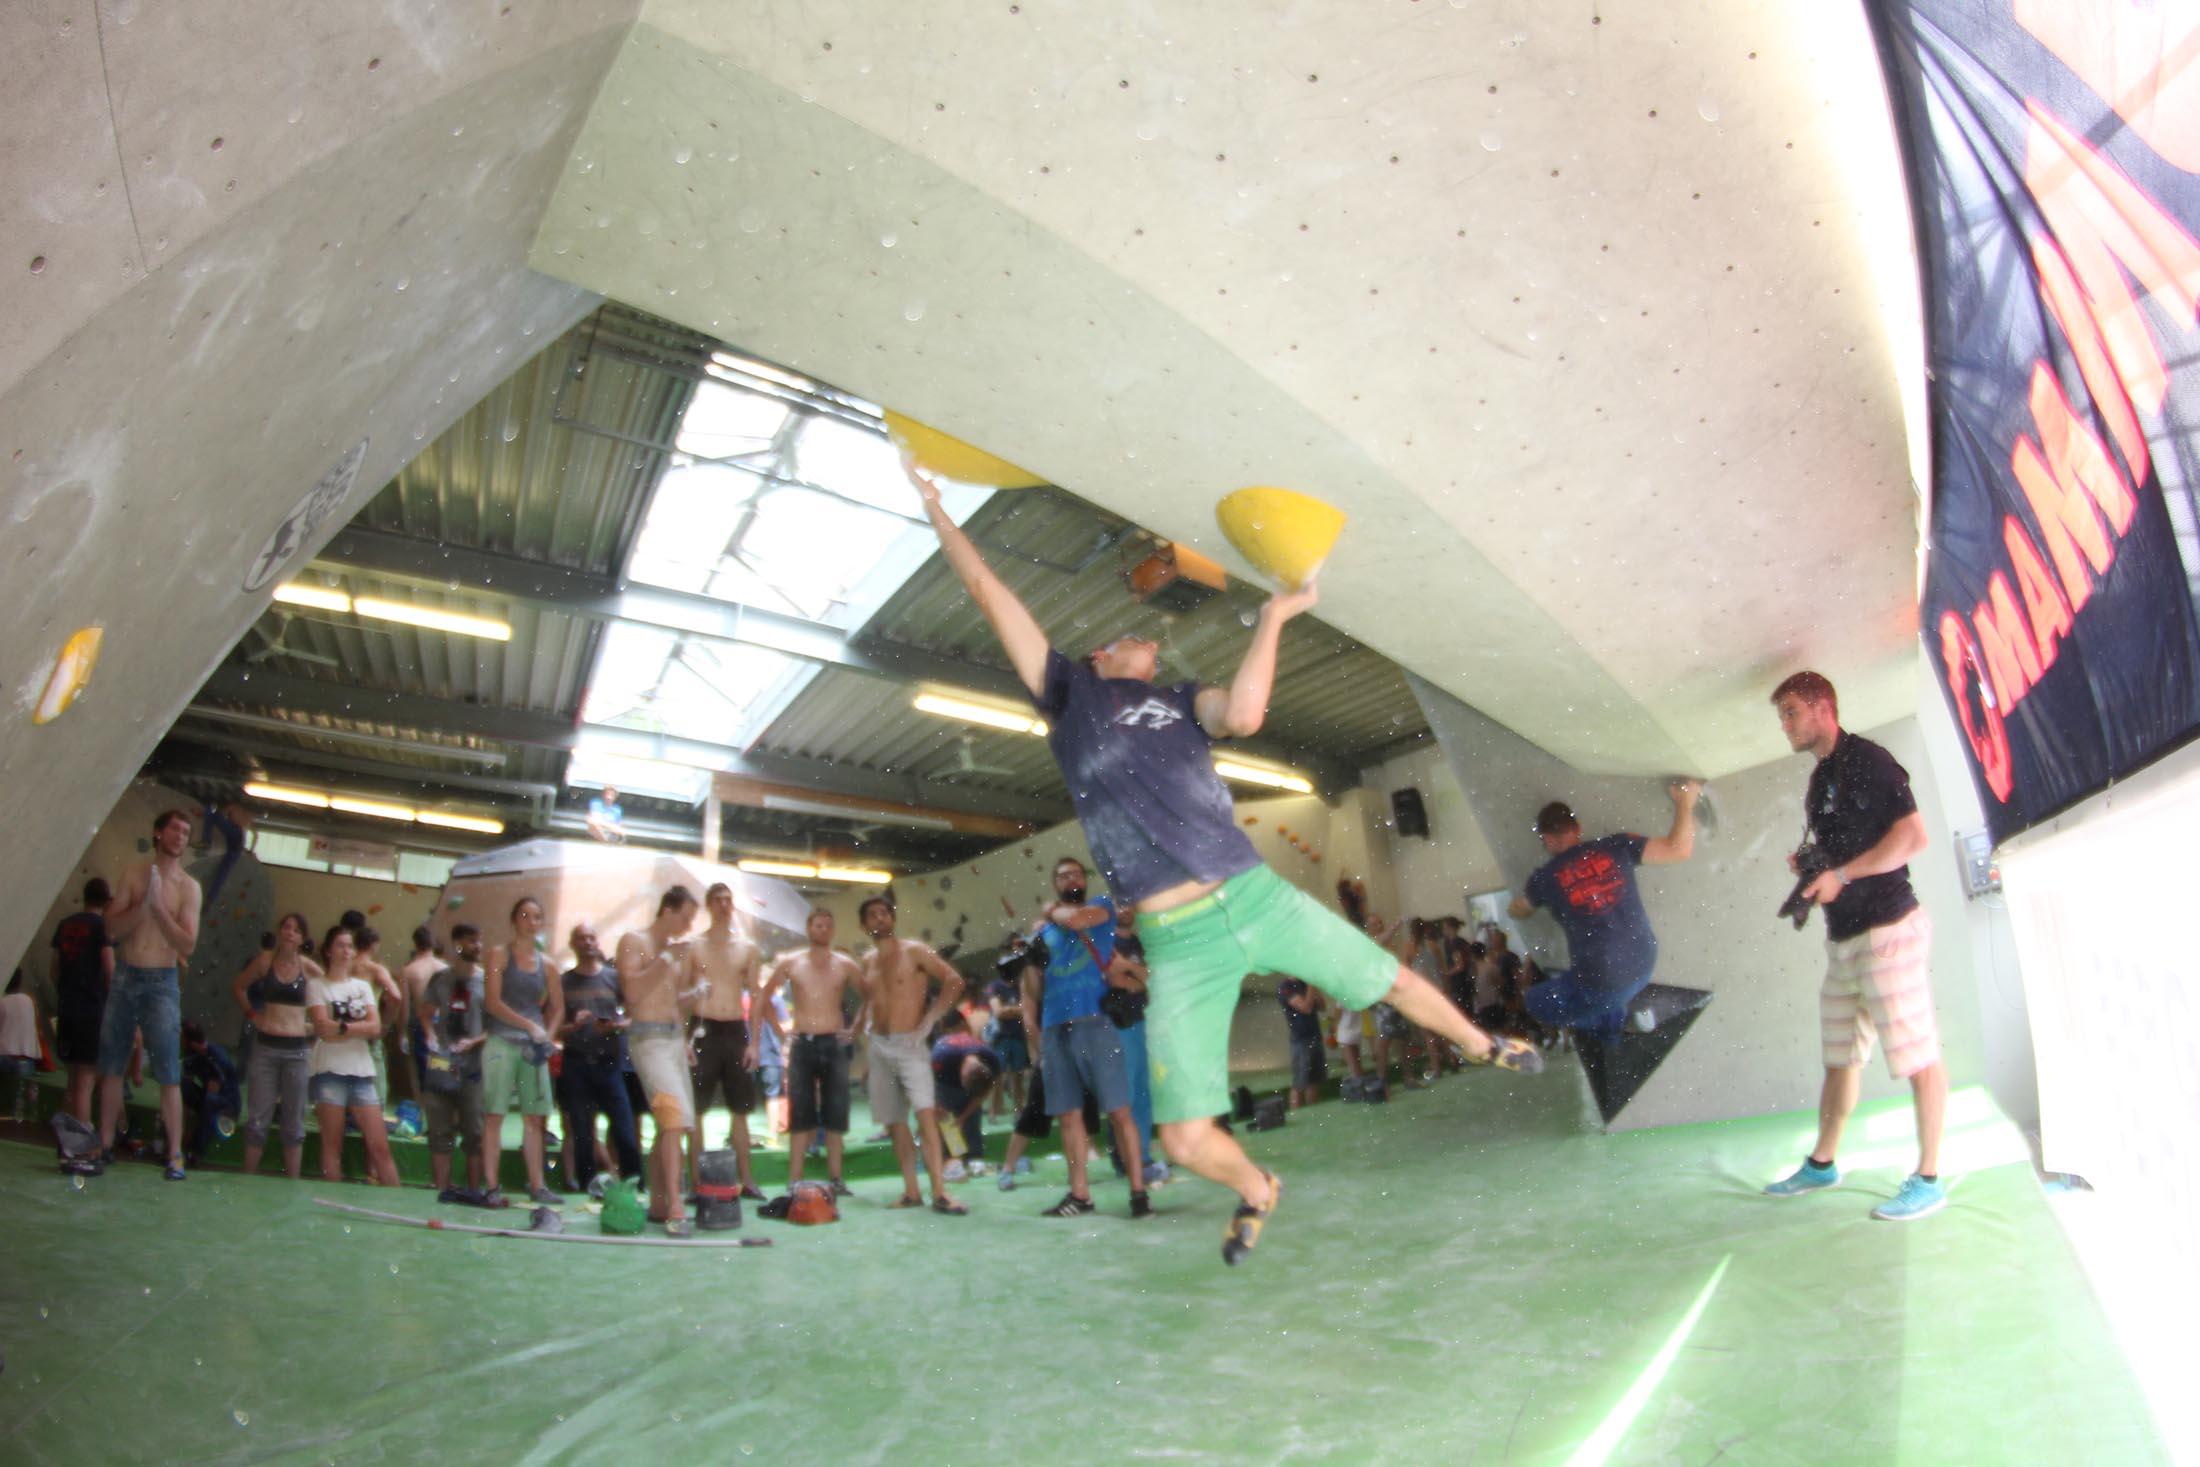 Quali, internationaler bouldercup Frankenjura 2016, BLOCKHELDEN Erlangen, Mammut, Bergfreunde.de, Boulderwettkampf07092016173